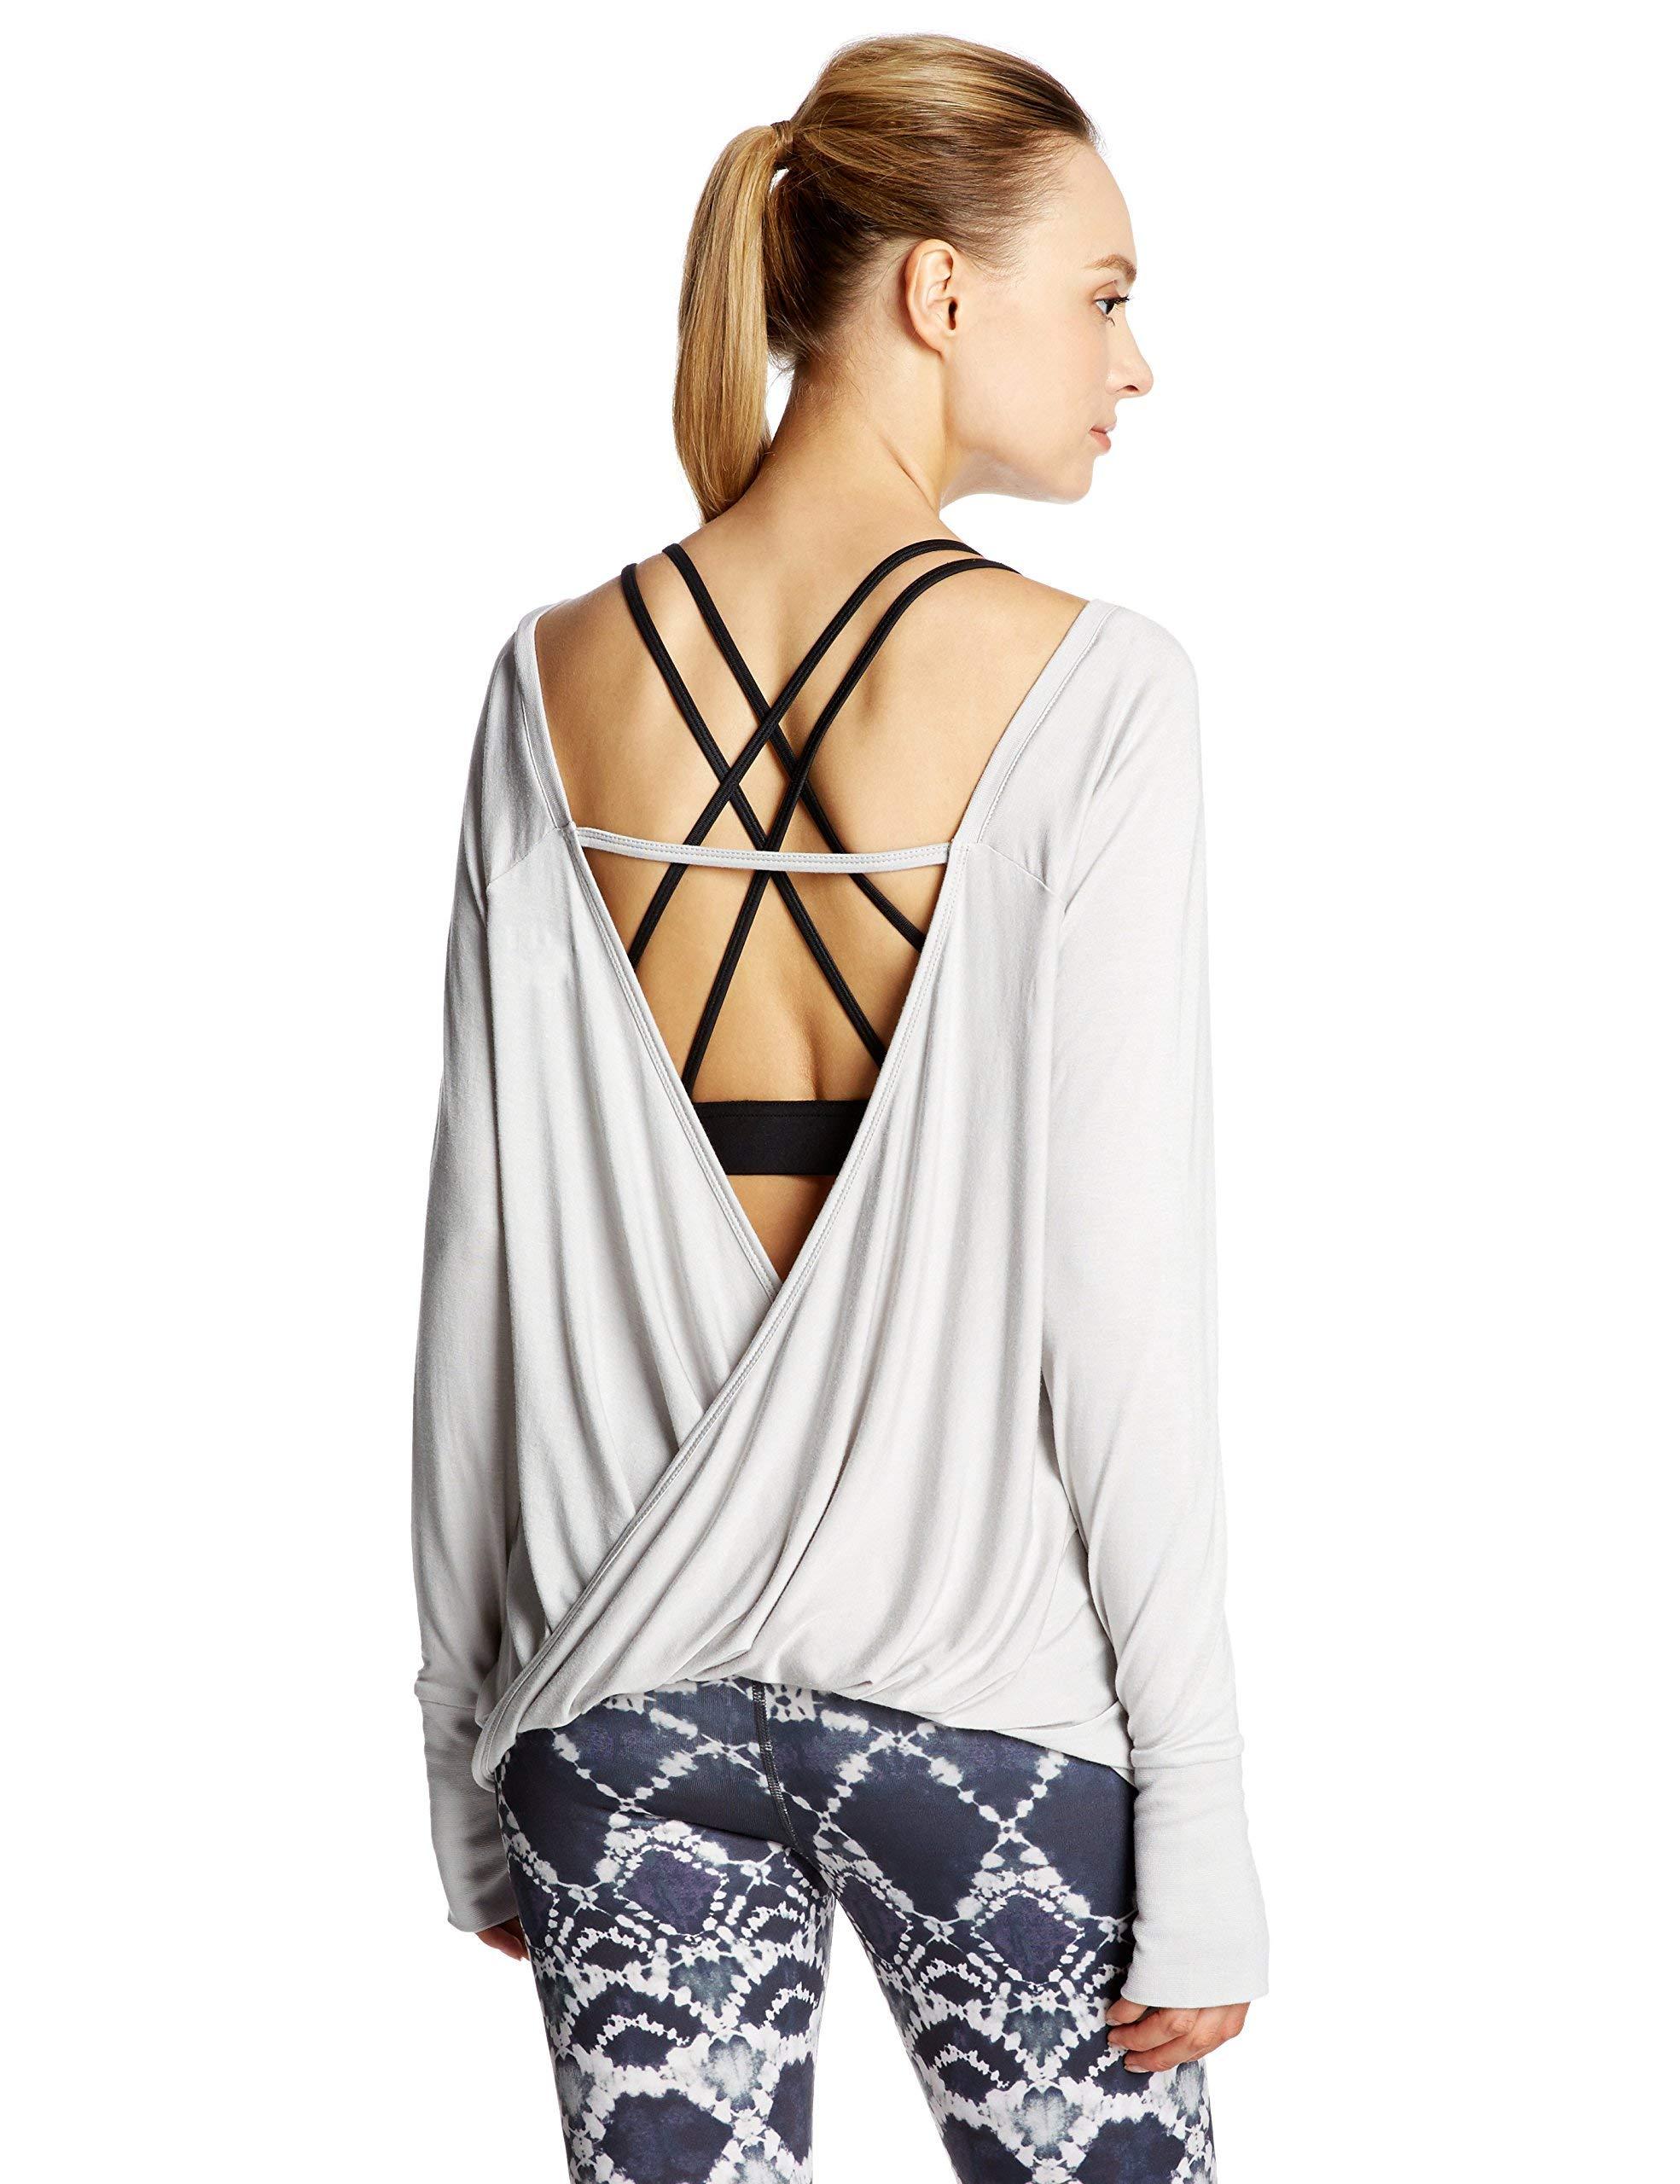 7Goals Women's Open-Back Loose-Fit Long-Sleeve Workout Sweatshirt, Oyster, S